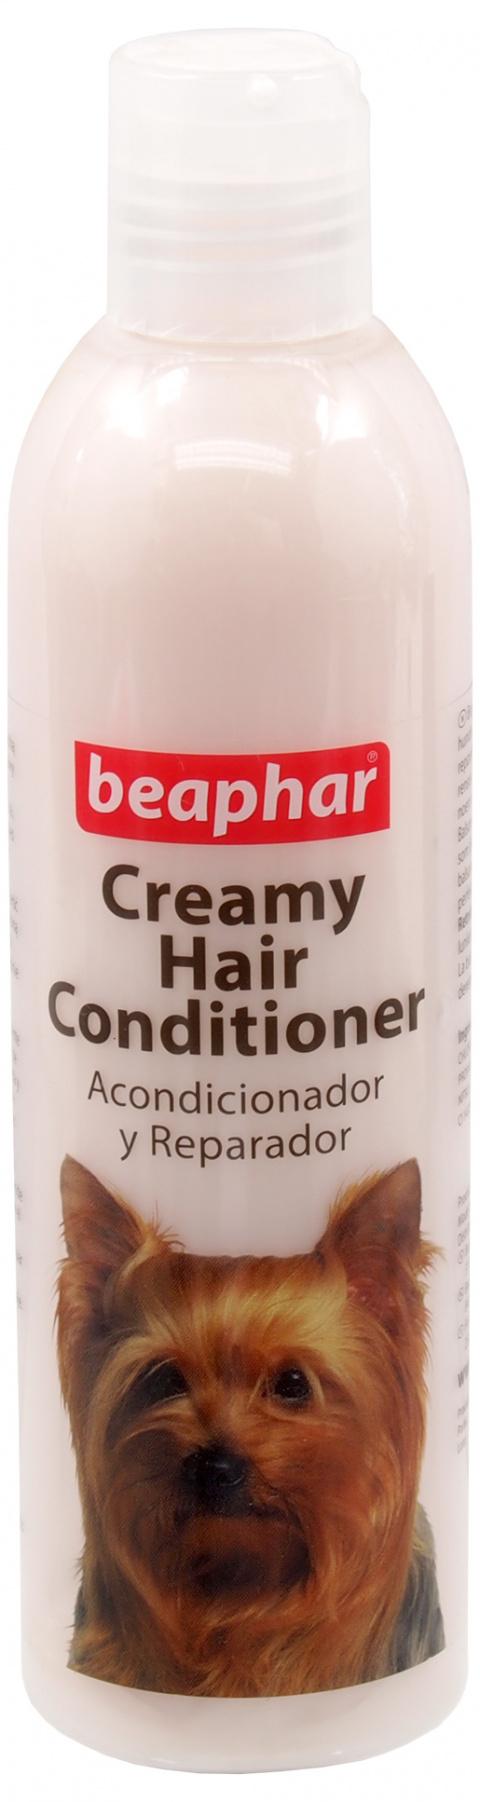 Кондиционер для собак - Beaphar Creamy Hair Conditioner, 250 мл